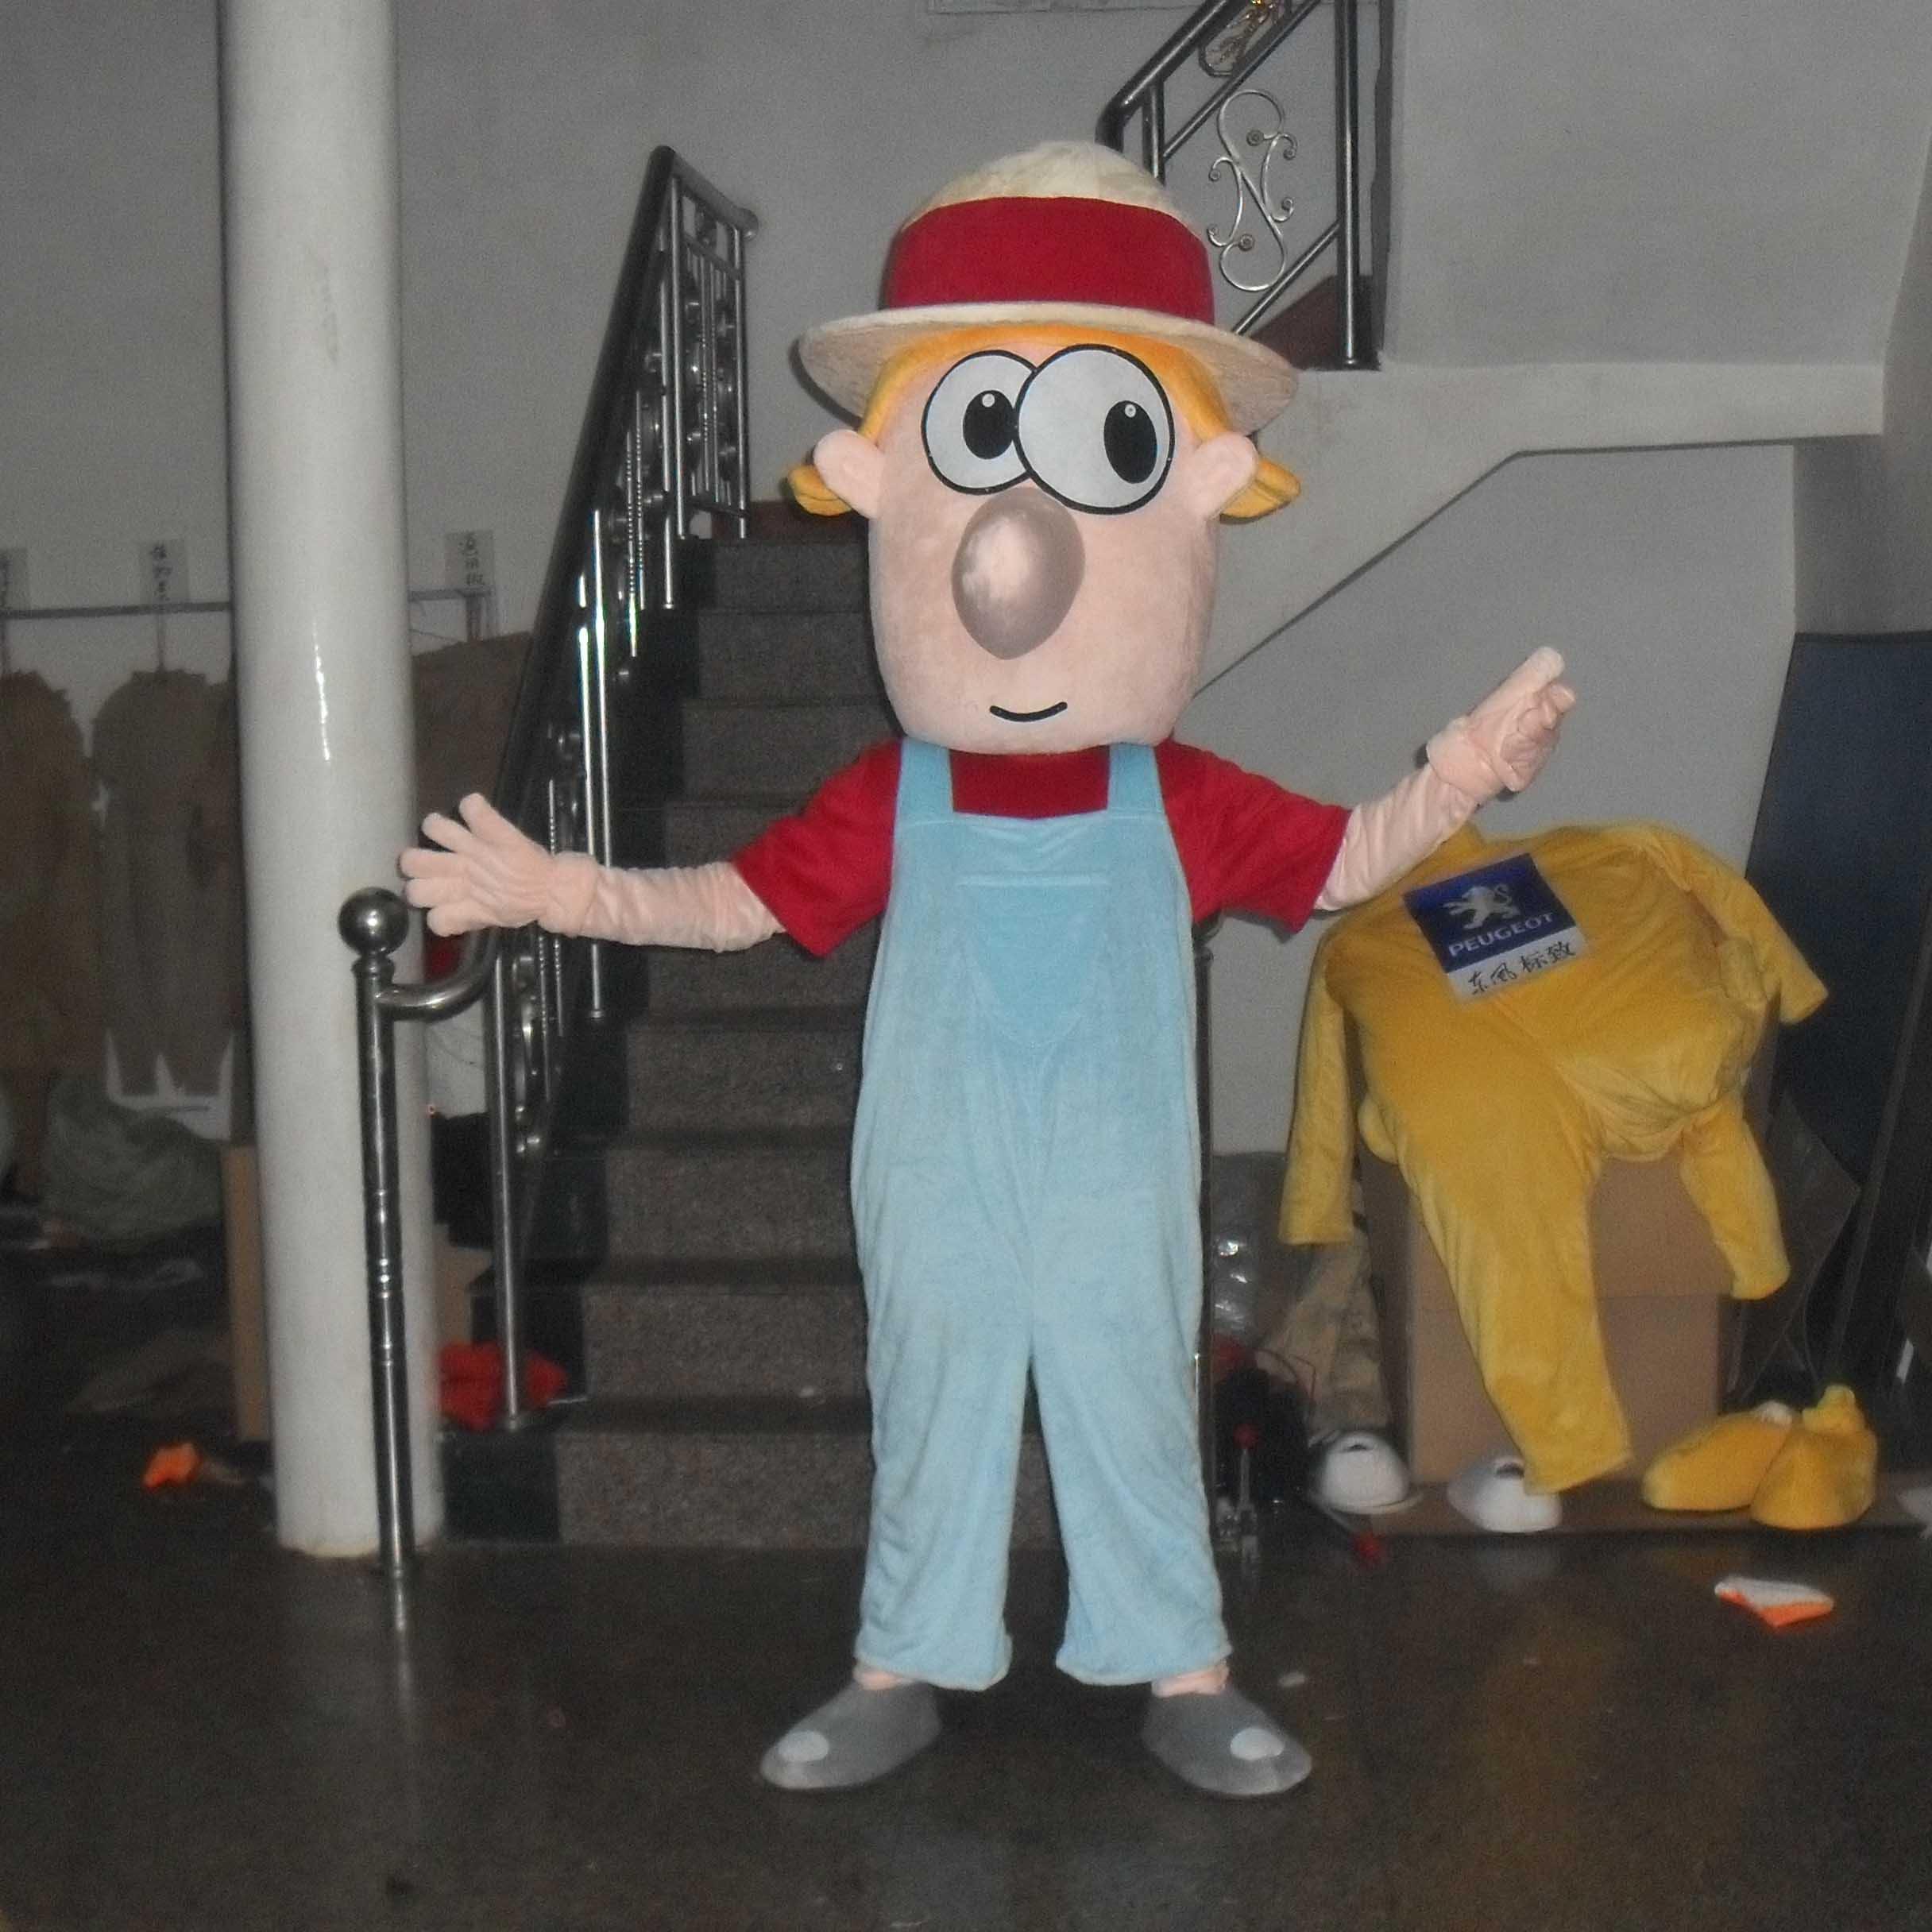 Cartoon Characters Cartoon Doll Clothing Cartoon Walking Doll Clothing Cartoon Show Clothing Doll Clothes Mascot Costume